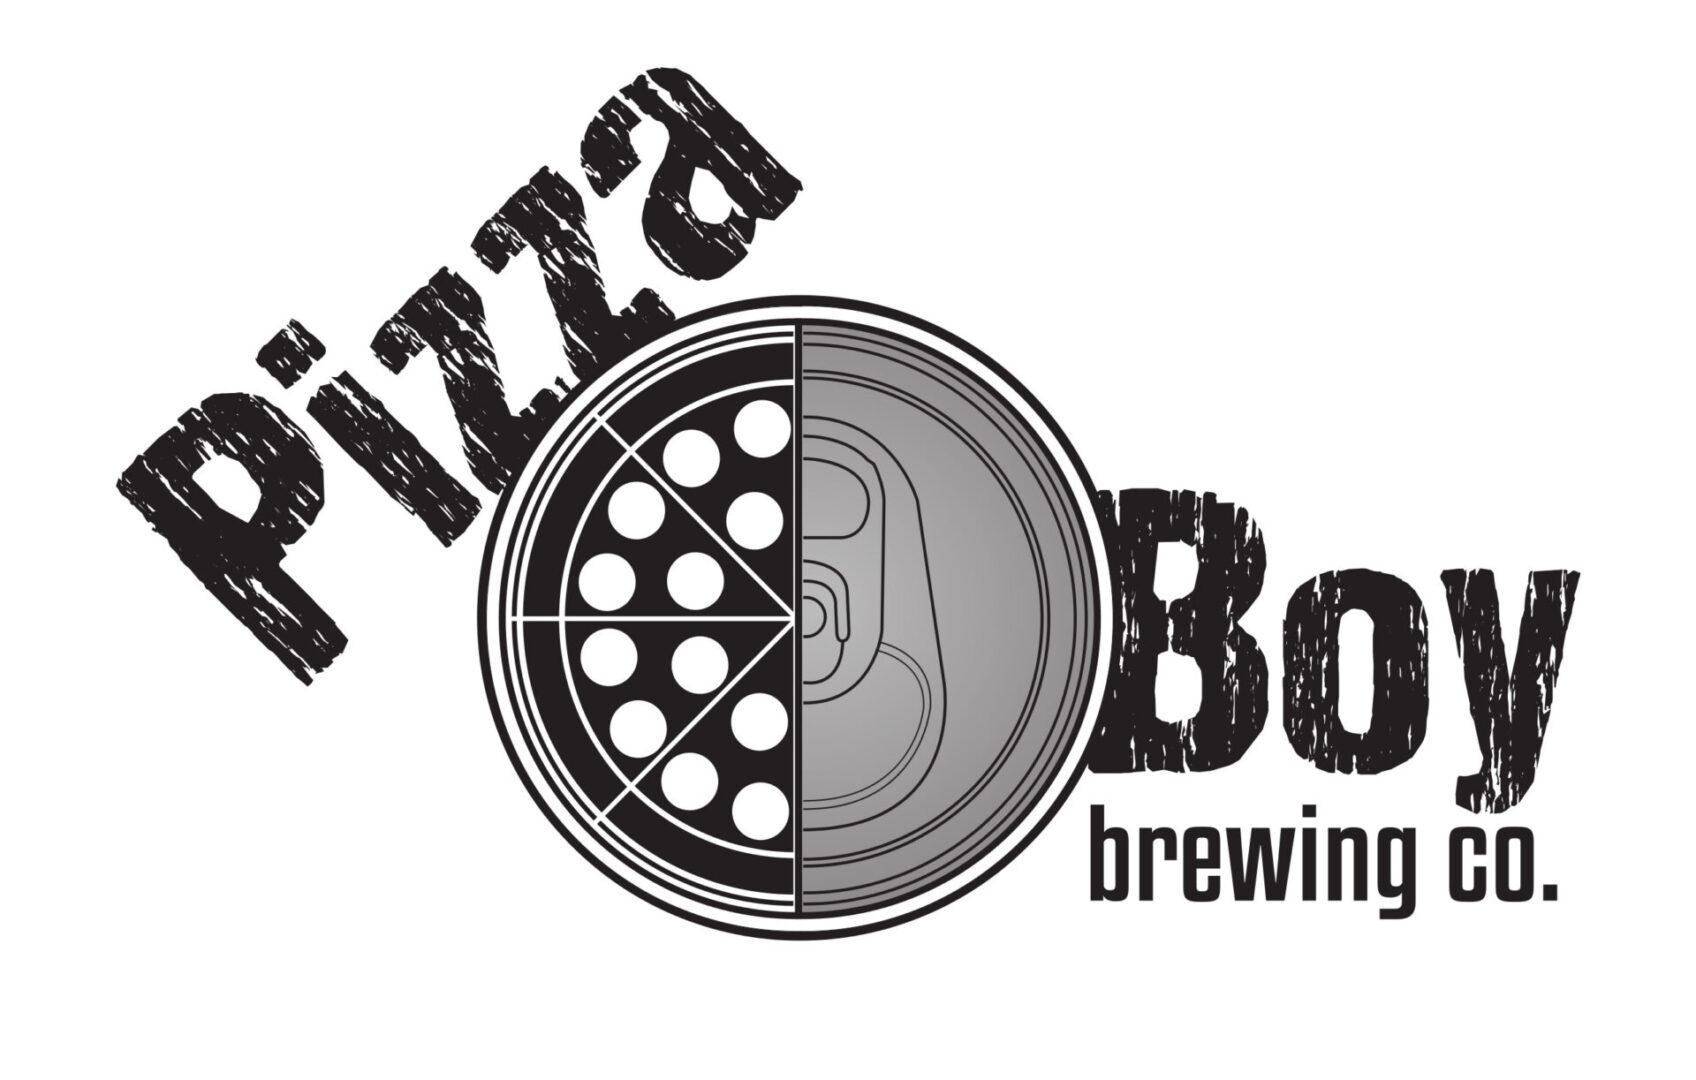 https://secureservercdn.net/198.71.233.39/ejs.c25.myftpupload.com/wp-content/uploads/2020/02/logo-pizza_boy_brewing-1-scaled.jpg